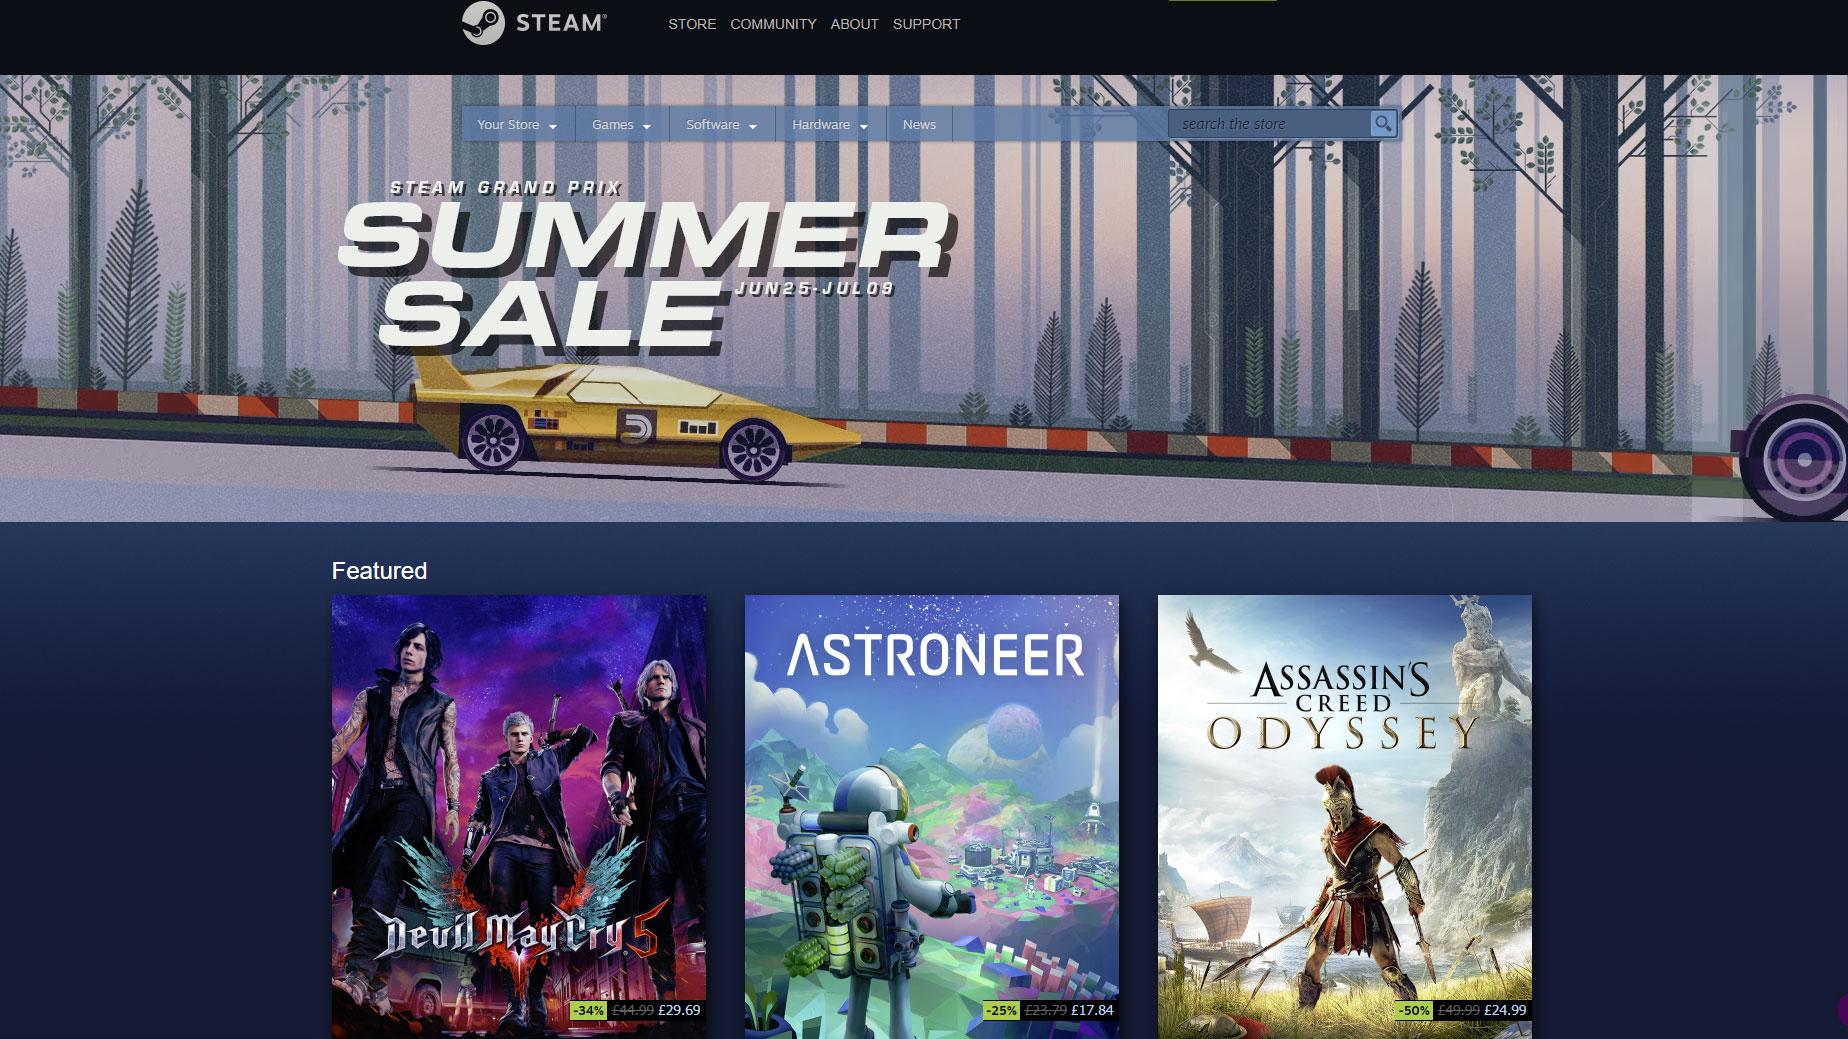 Steamworks Fix Astroneer